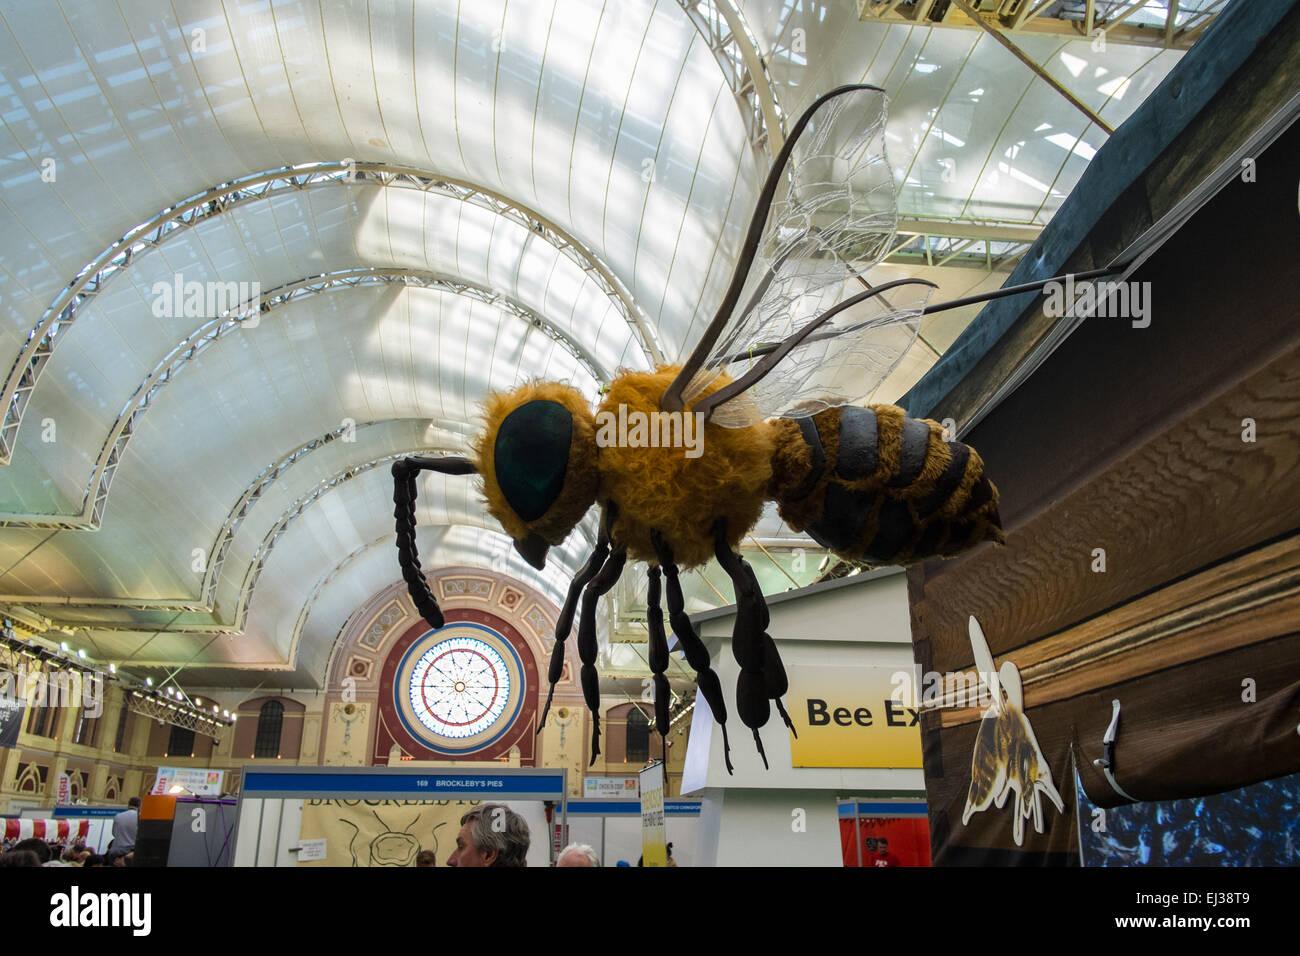 London Bee Stockfotos & London Bee Bilder - Seite 2 - Alamy